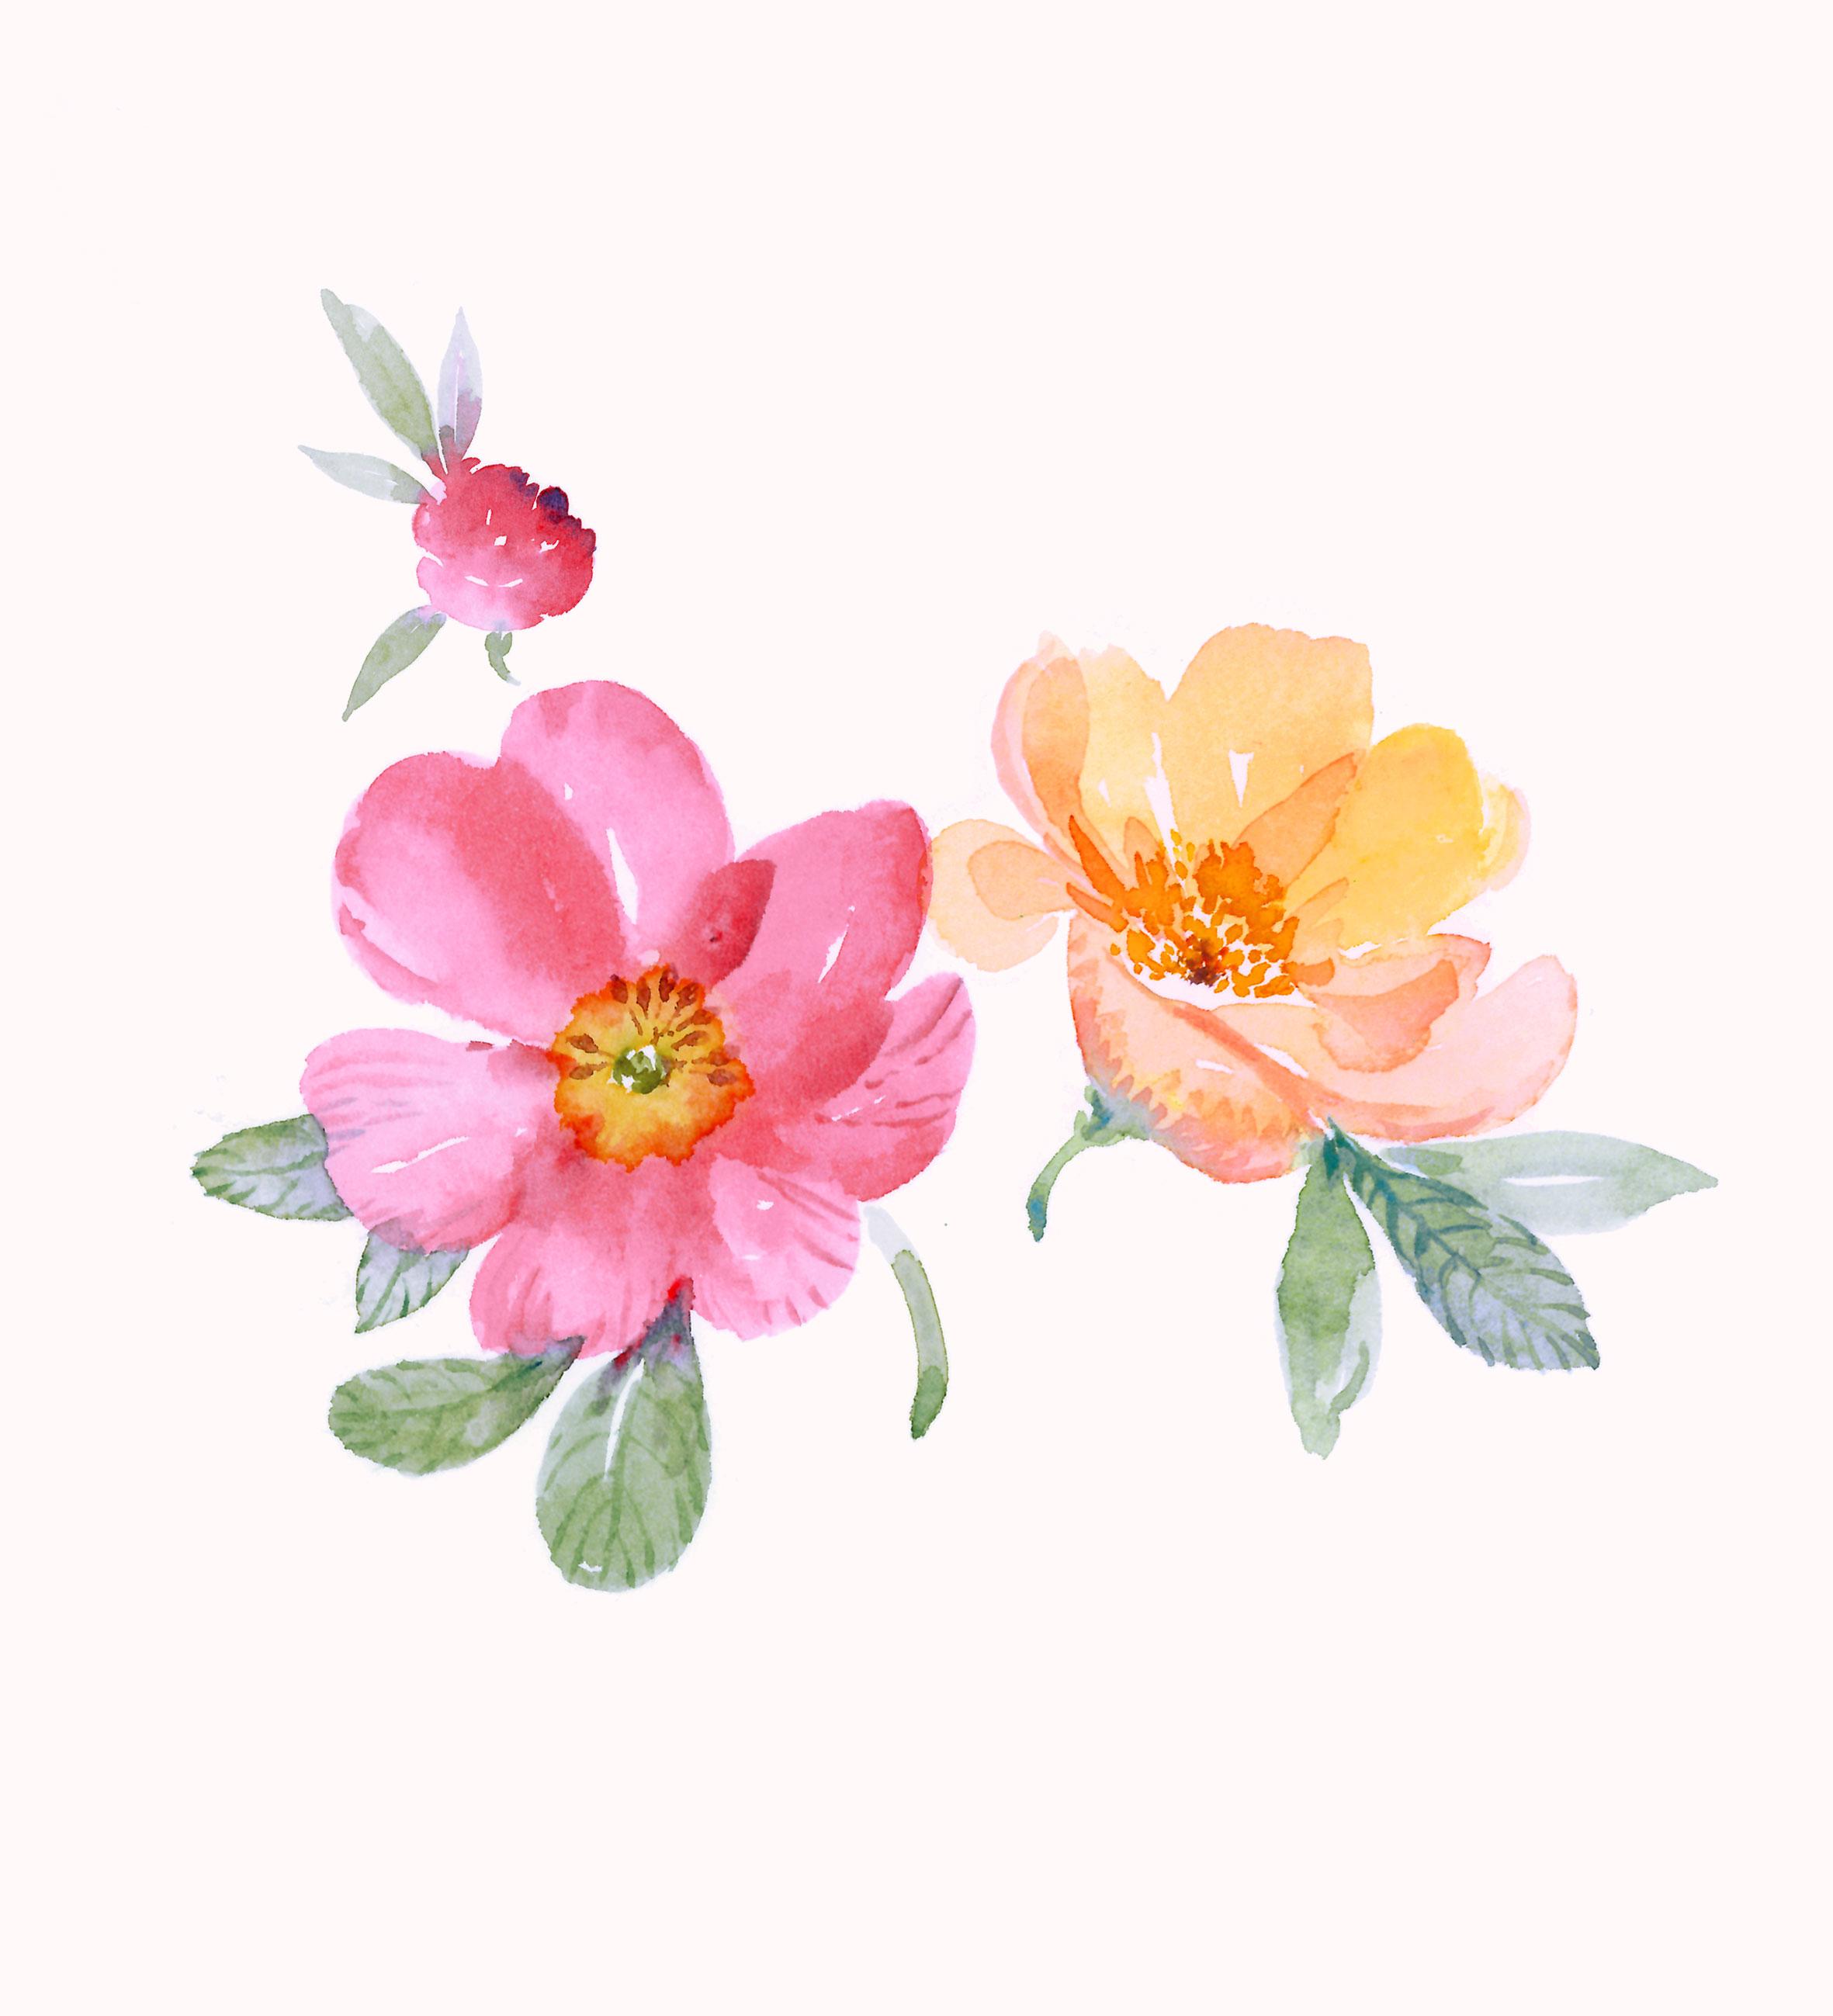 Tarlow-floral-2A.jpg